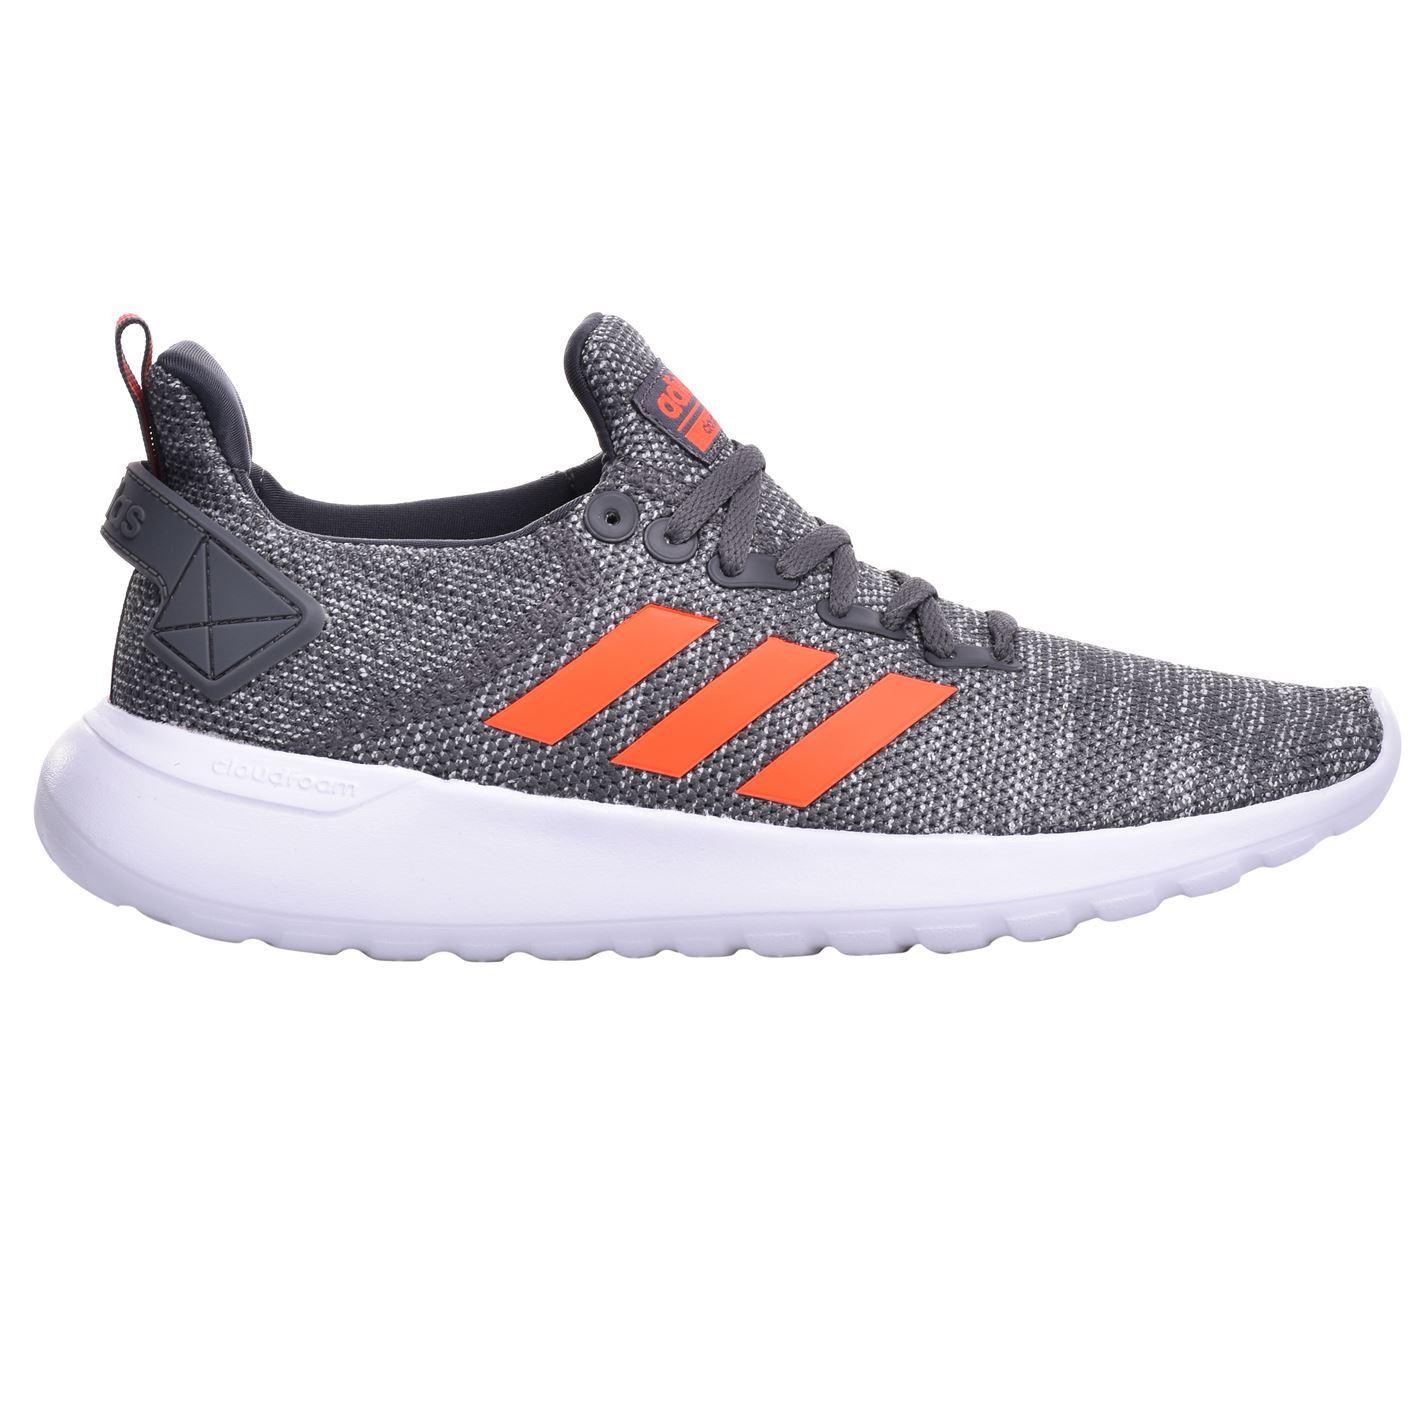 Adidas classic läufer lite racer von läufer classic 70ef3e